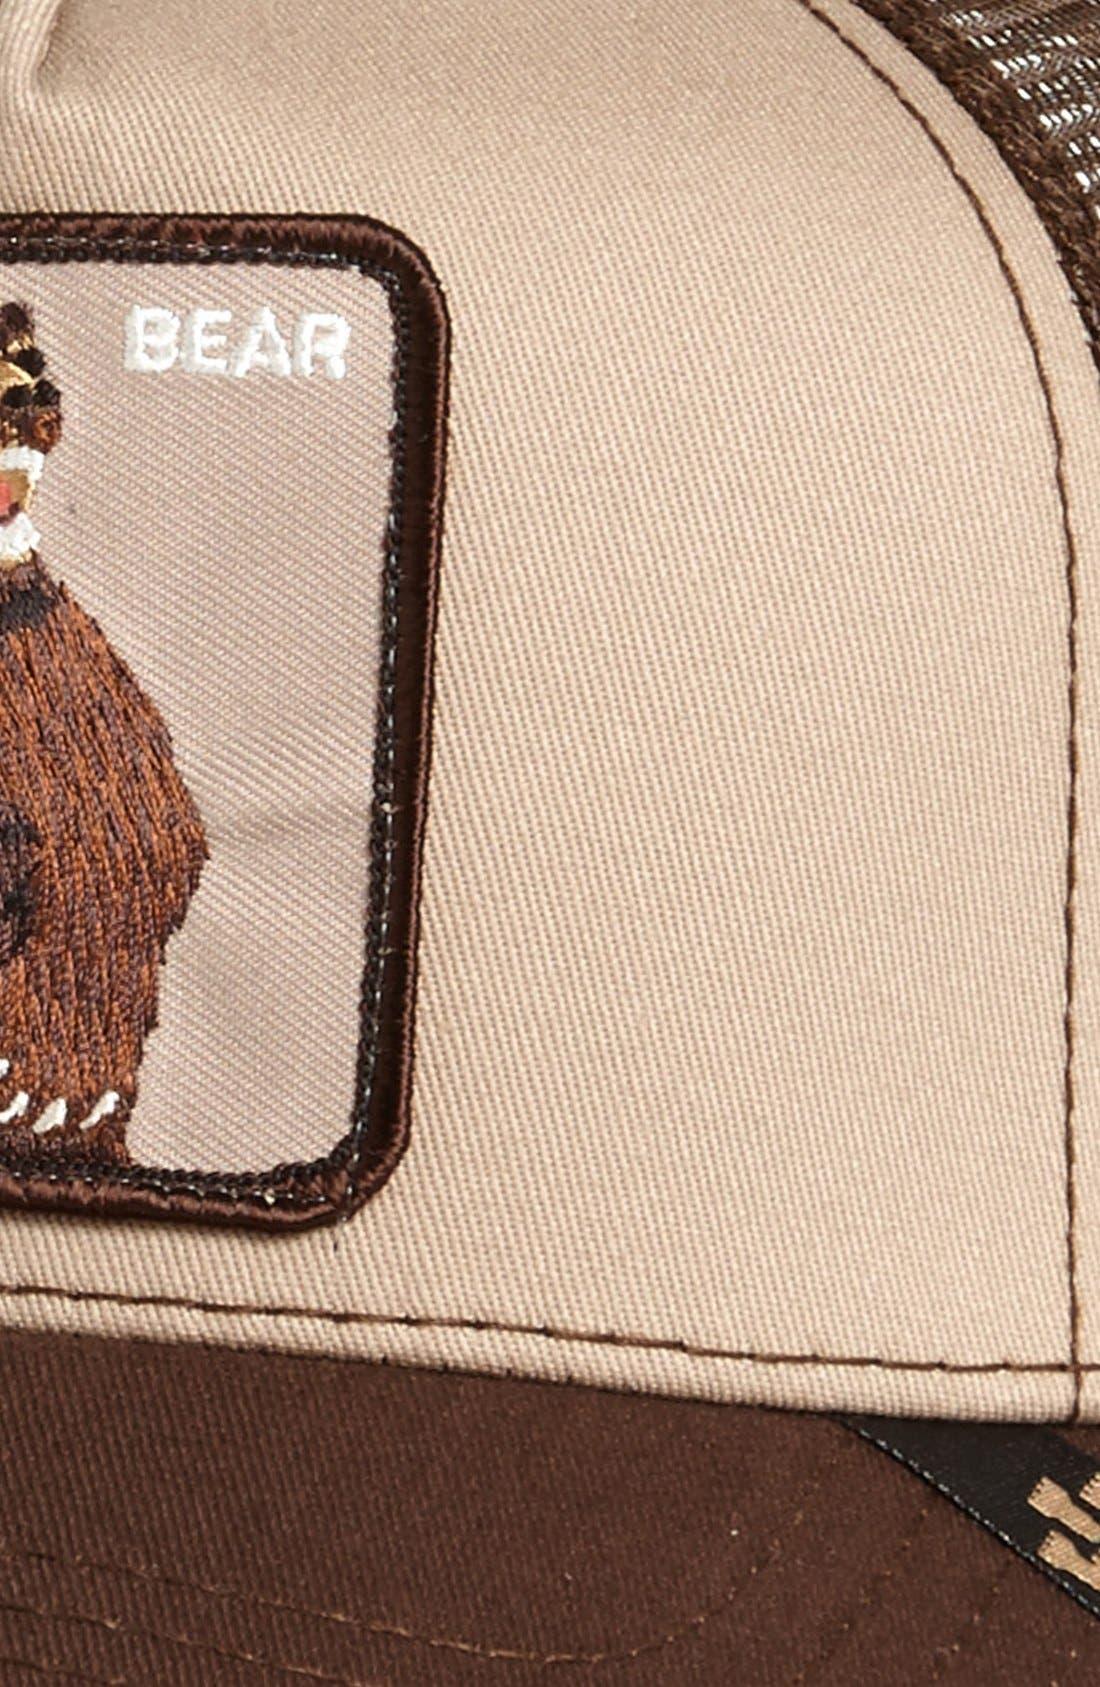 GOORIN BROTHERS,                             'Animal Farm - Lone Star Bear' Trucker Hat,                             Alternate thumbnail 3, color,                             201